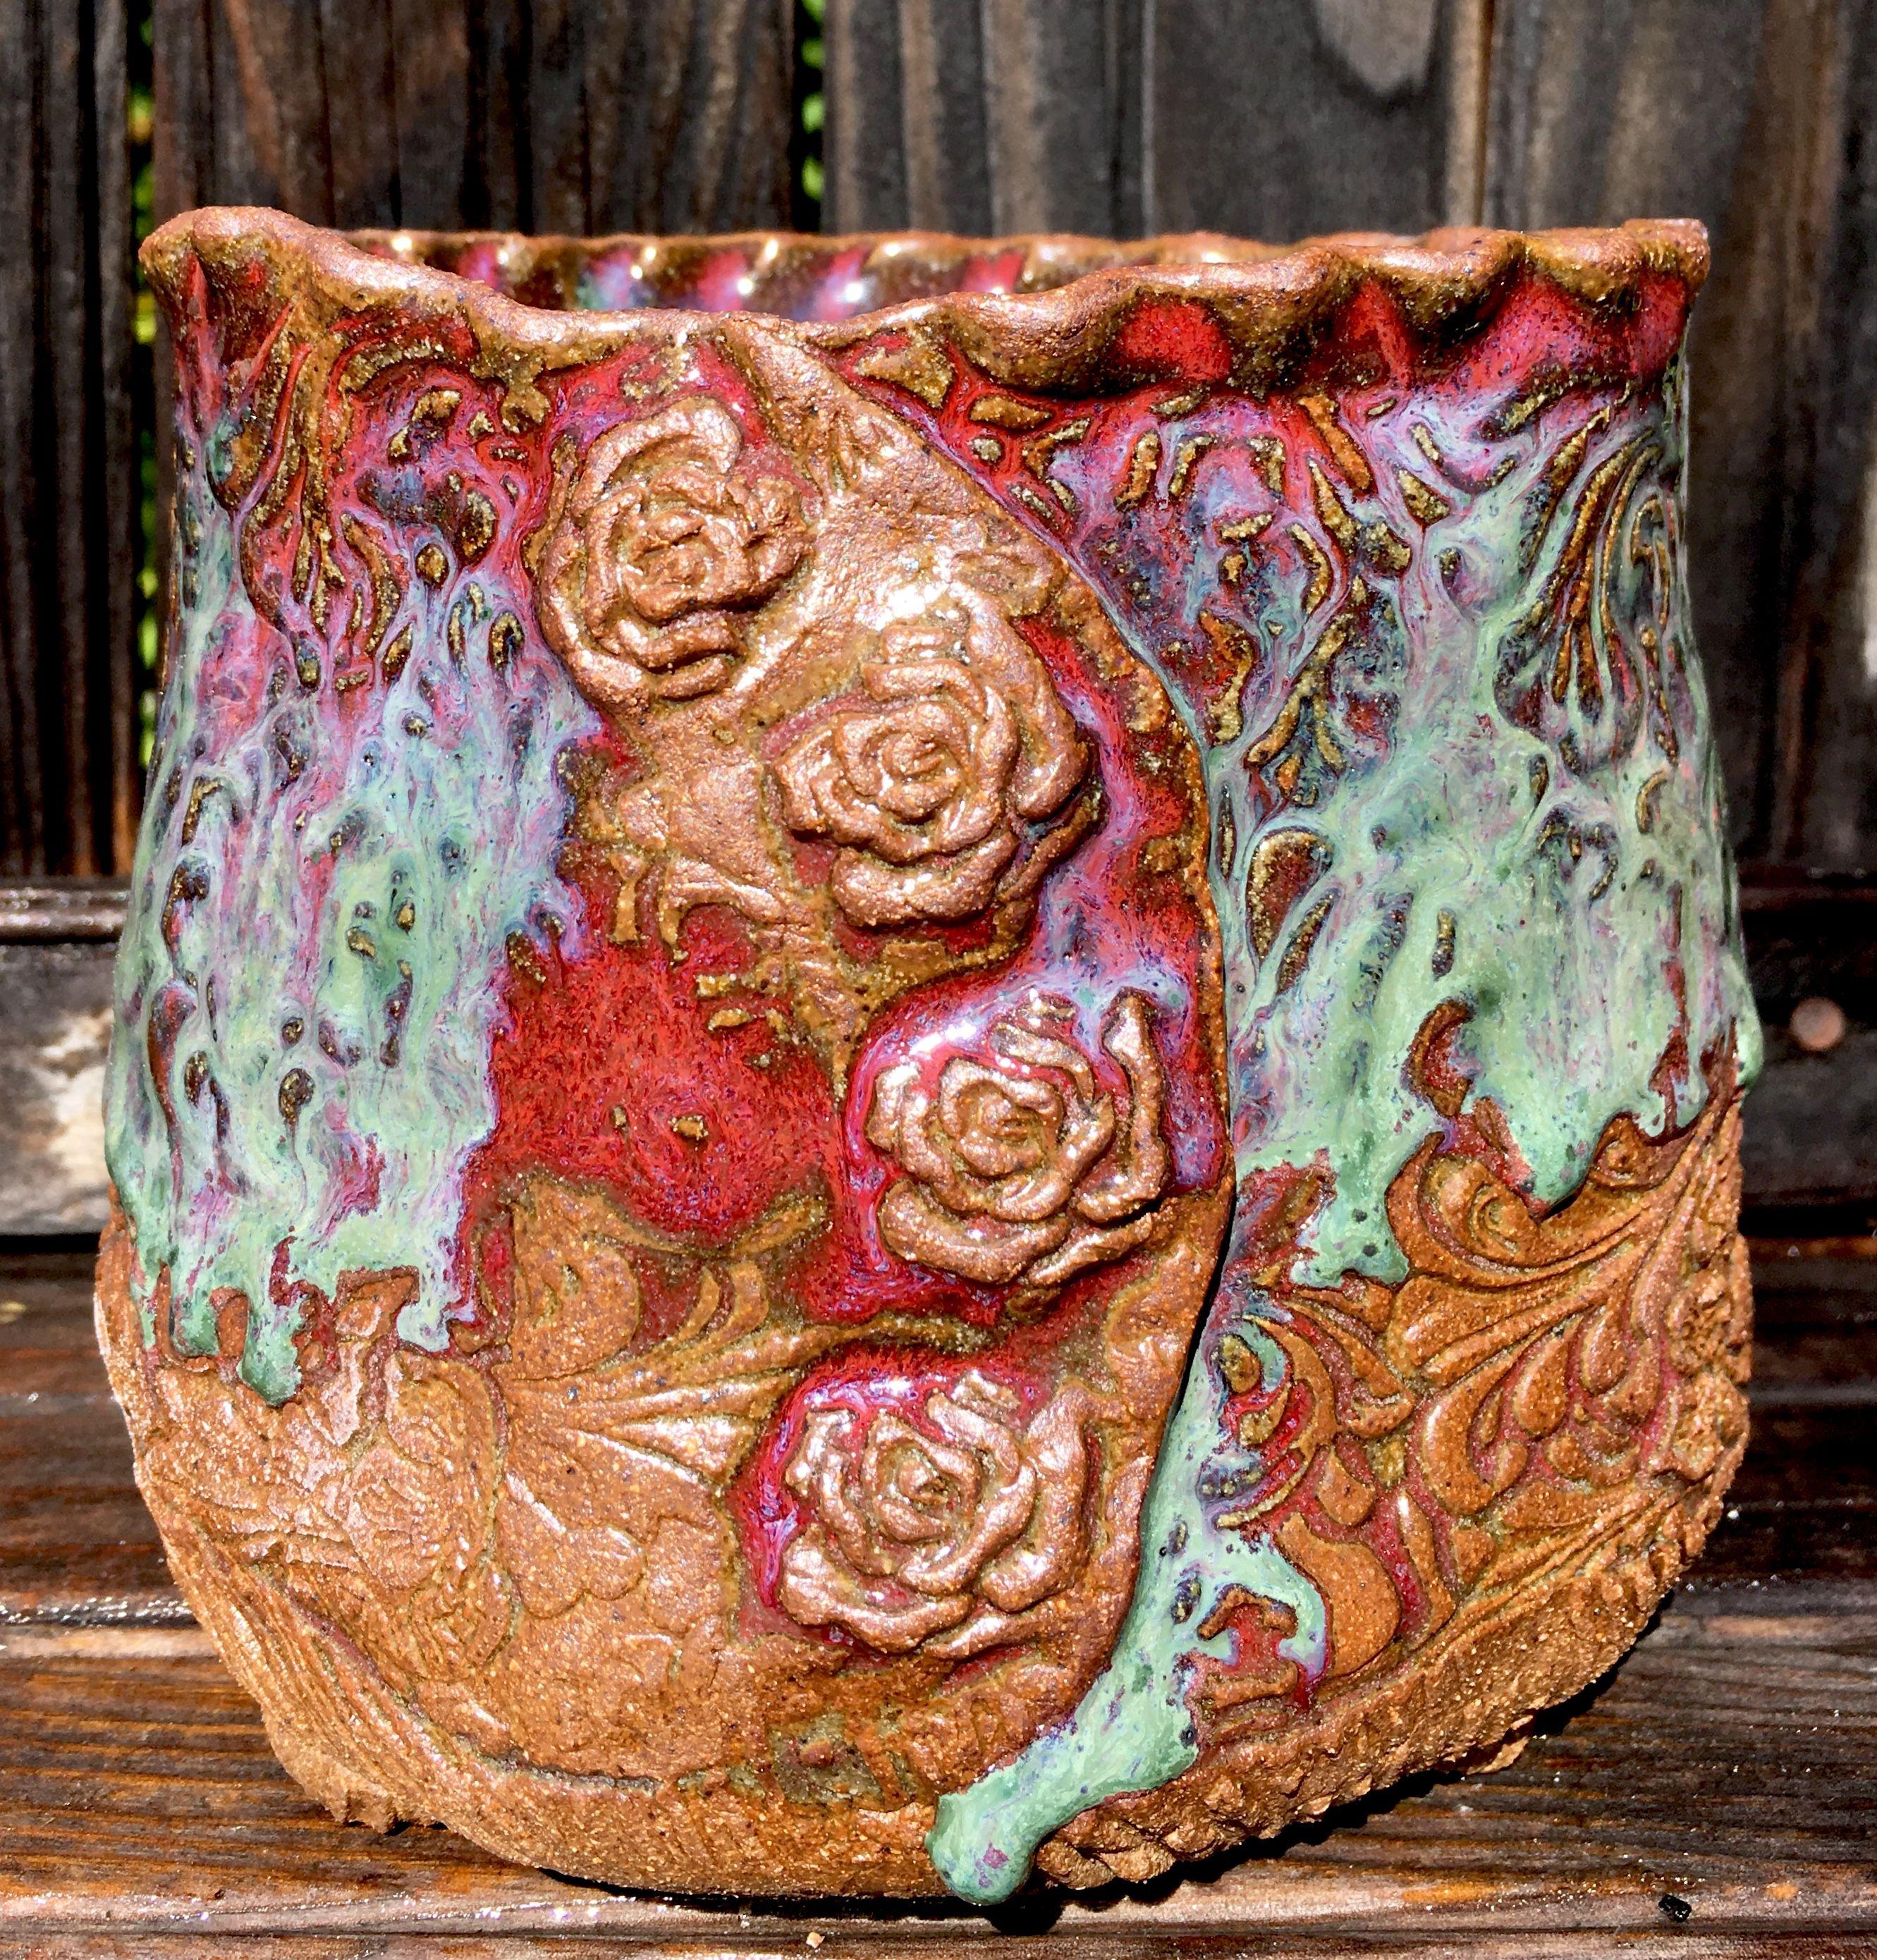 Pin by Karen McCants on karenmccantsart pottery Pottery